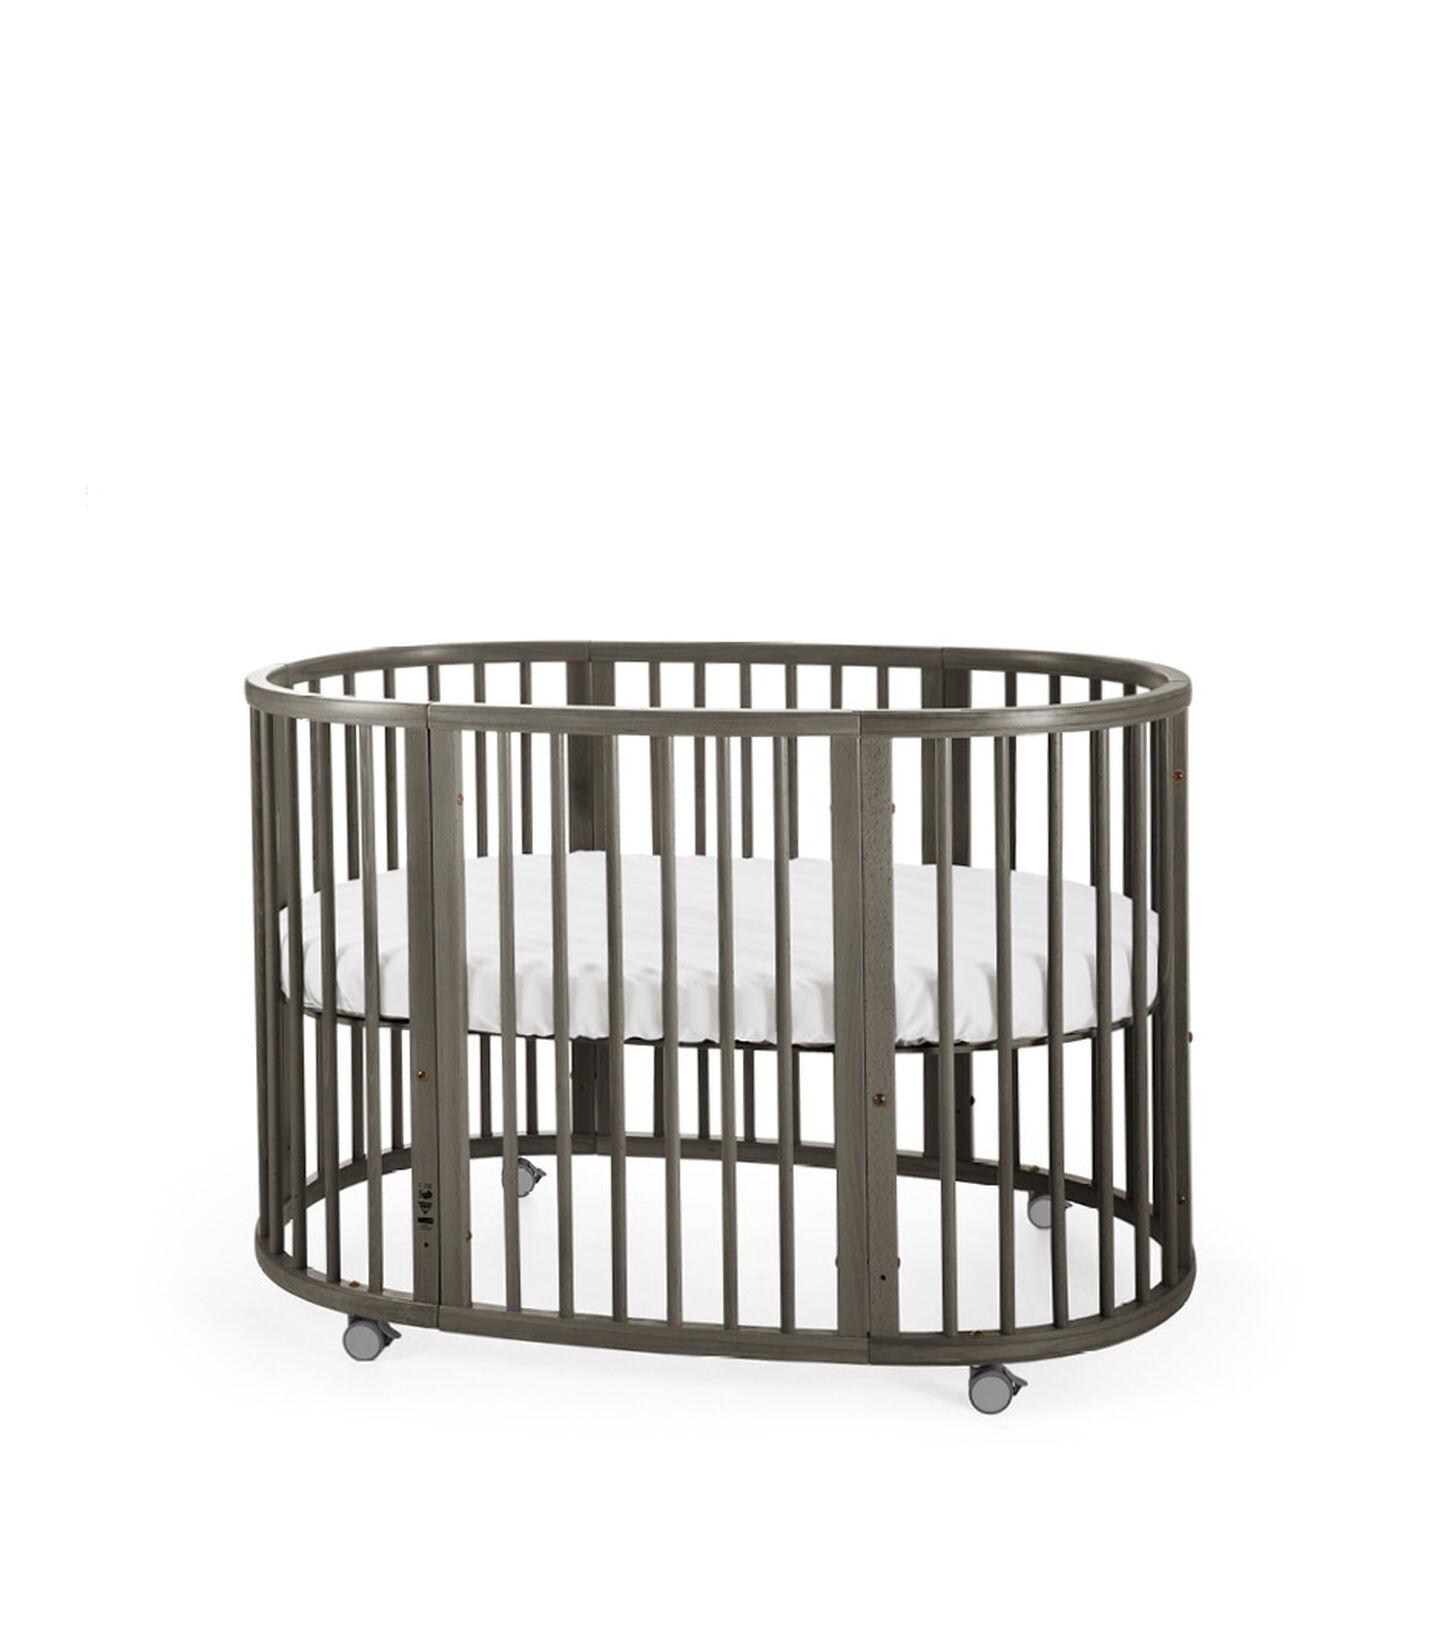 Stokke® Sleepi™ Bed Hazy Grey, Hazy Grey, mainview